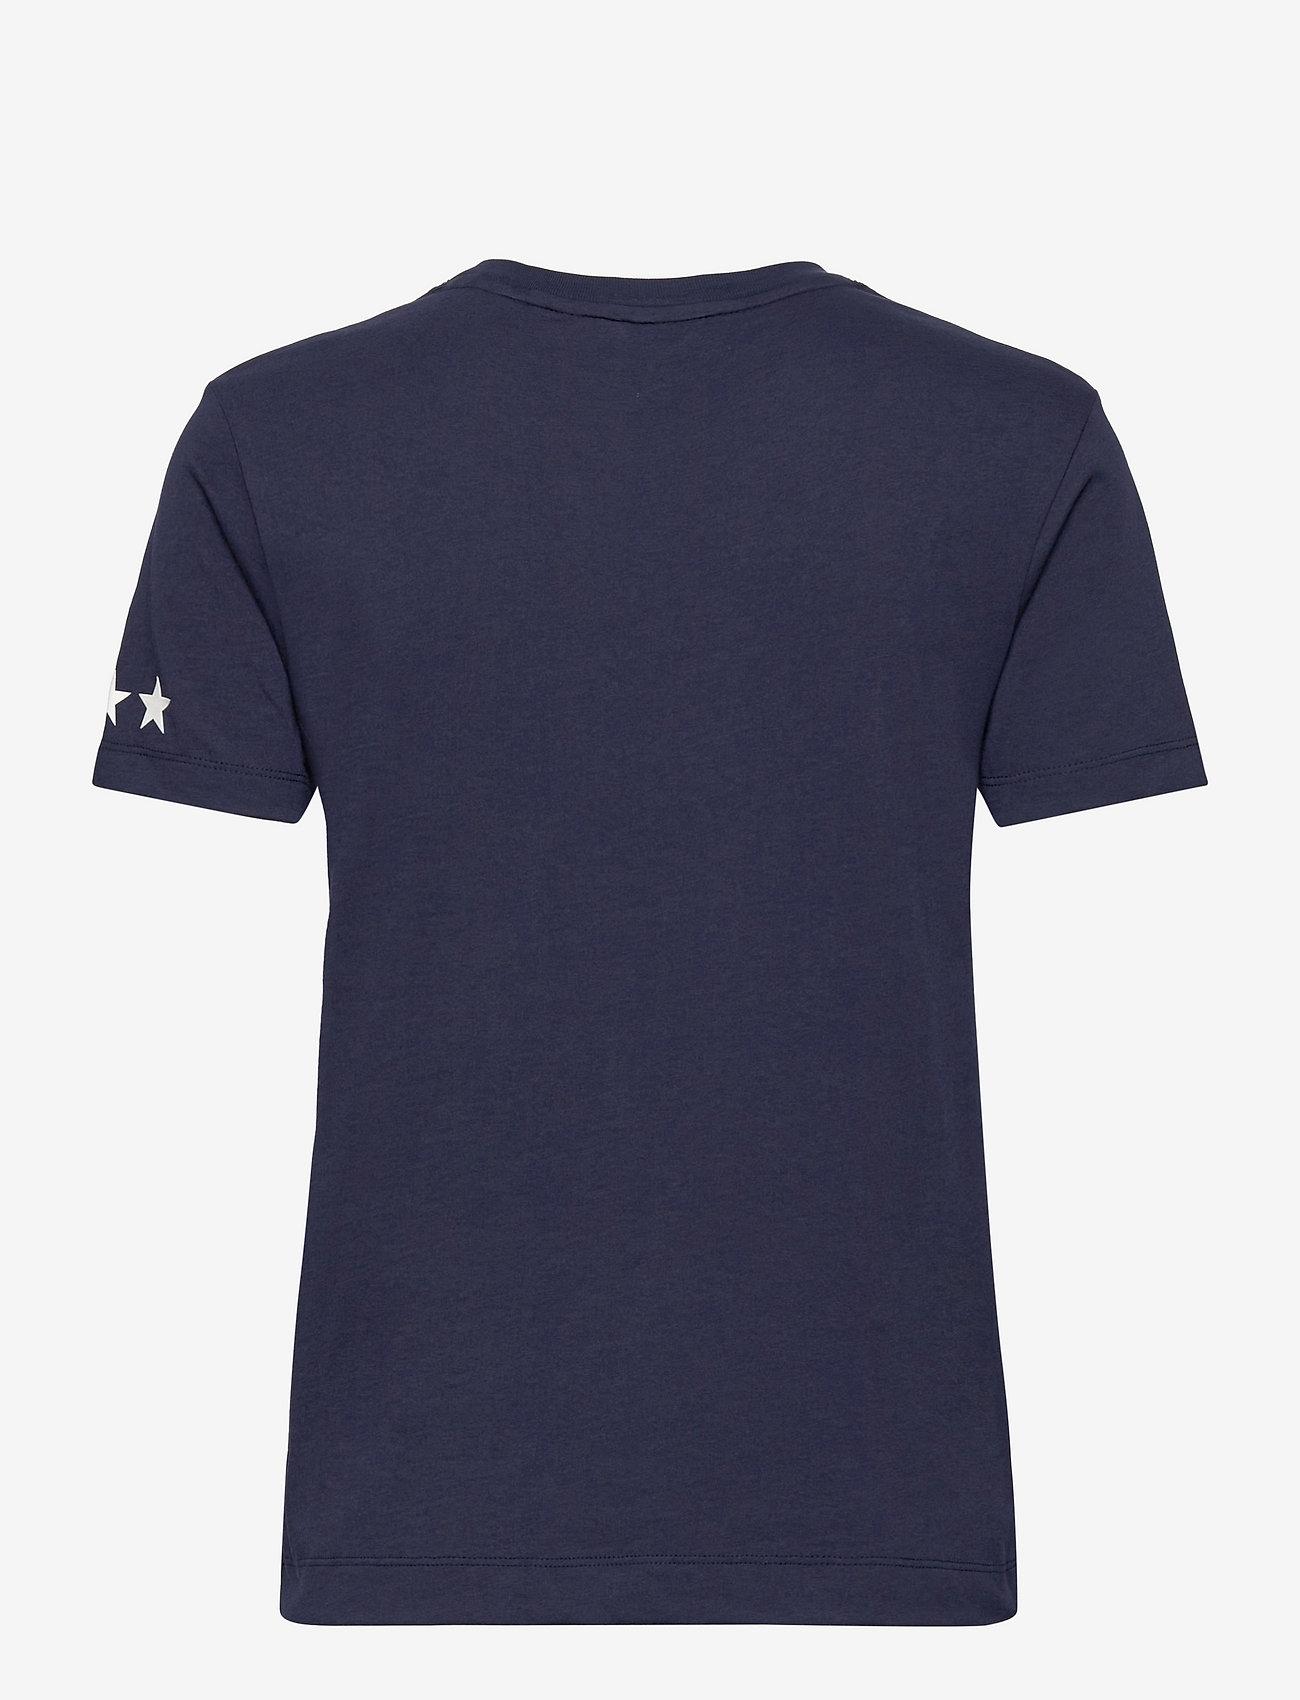 GANT - D2.GANT RETRO SHIELD SS T-SHIRT - t-shirts - classic blue - 1